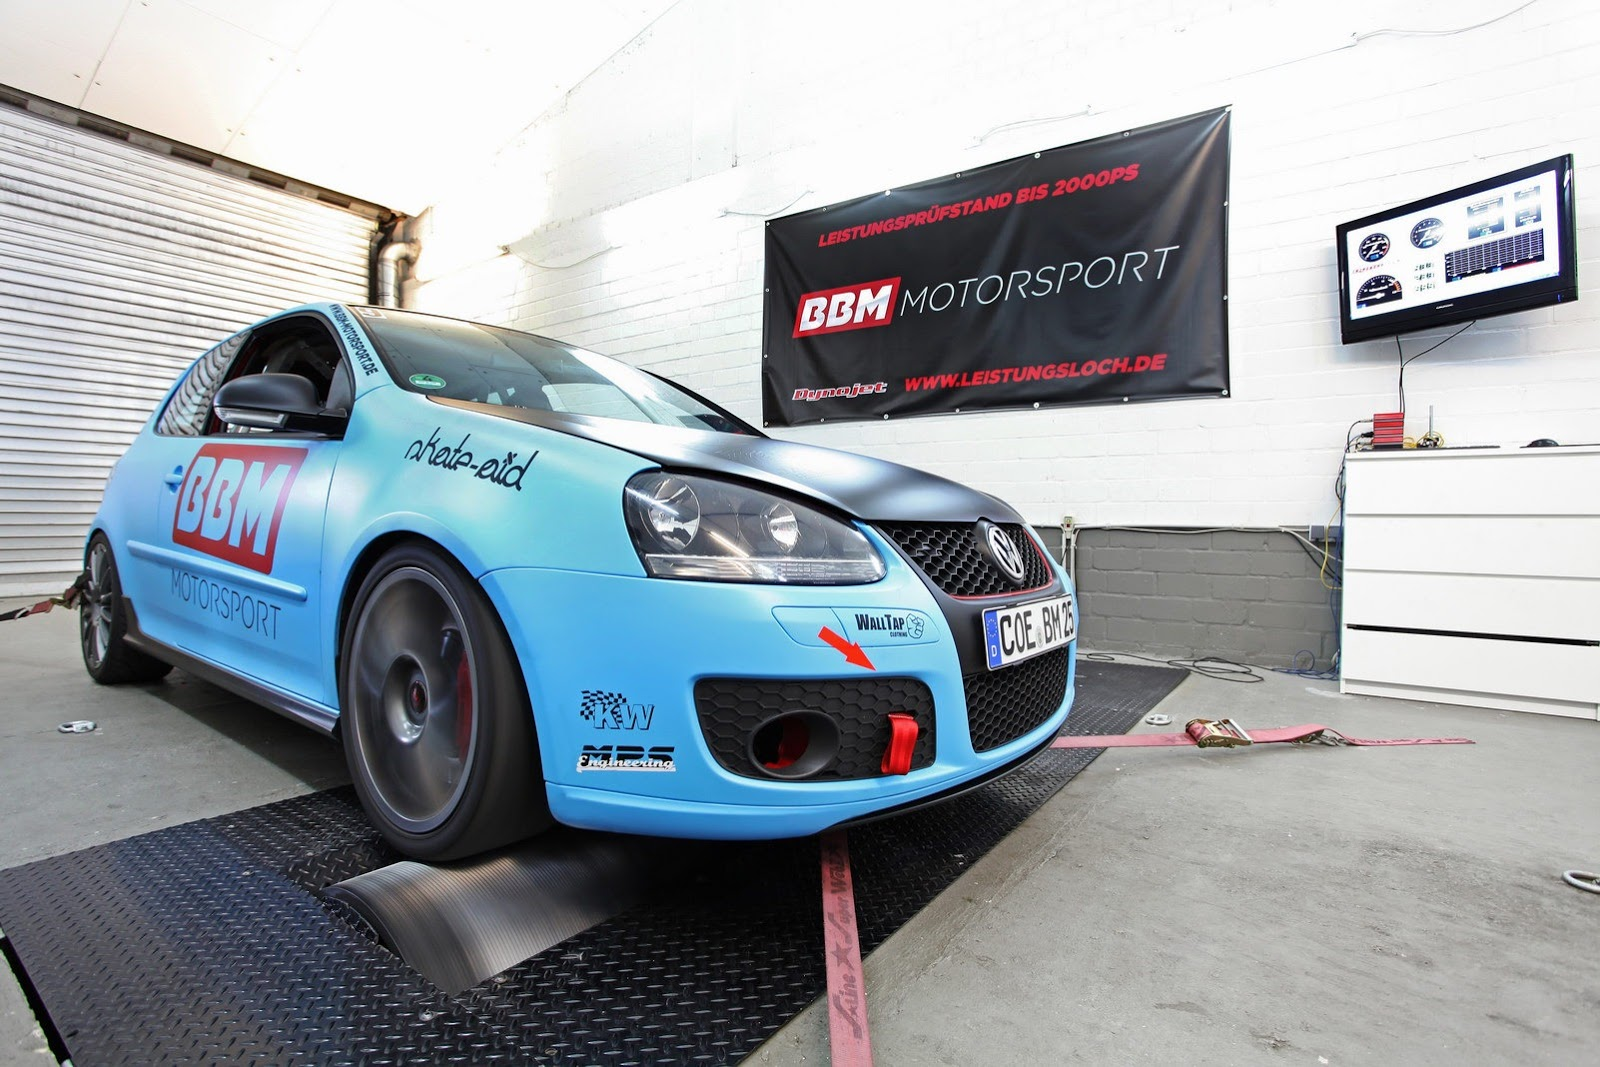 BBM Motorsport reveals VW Golf GTI V tuning kit